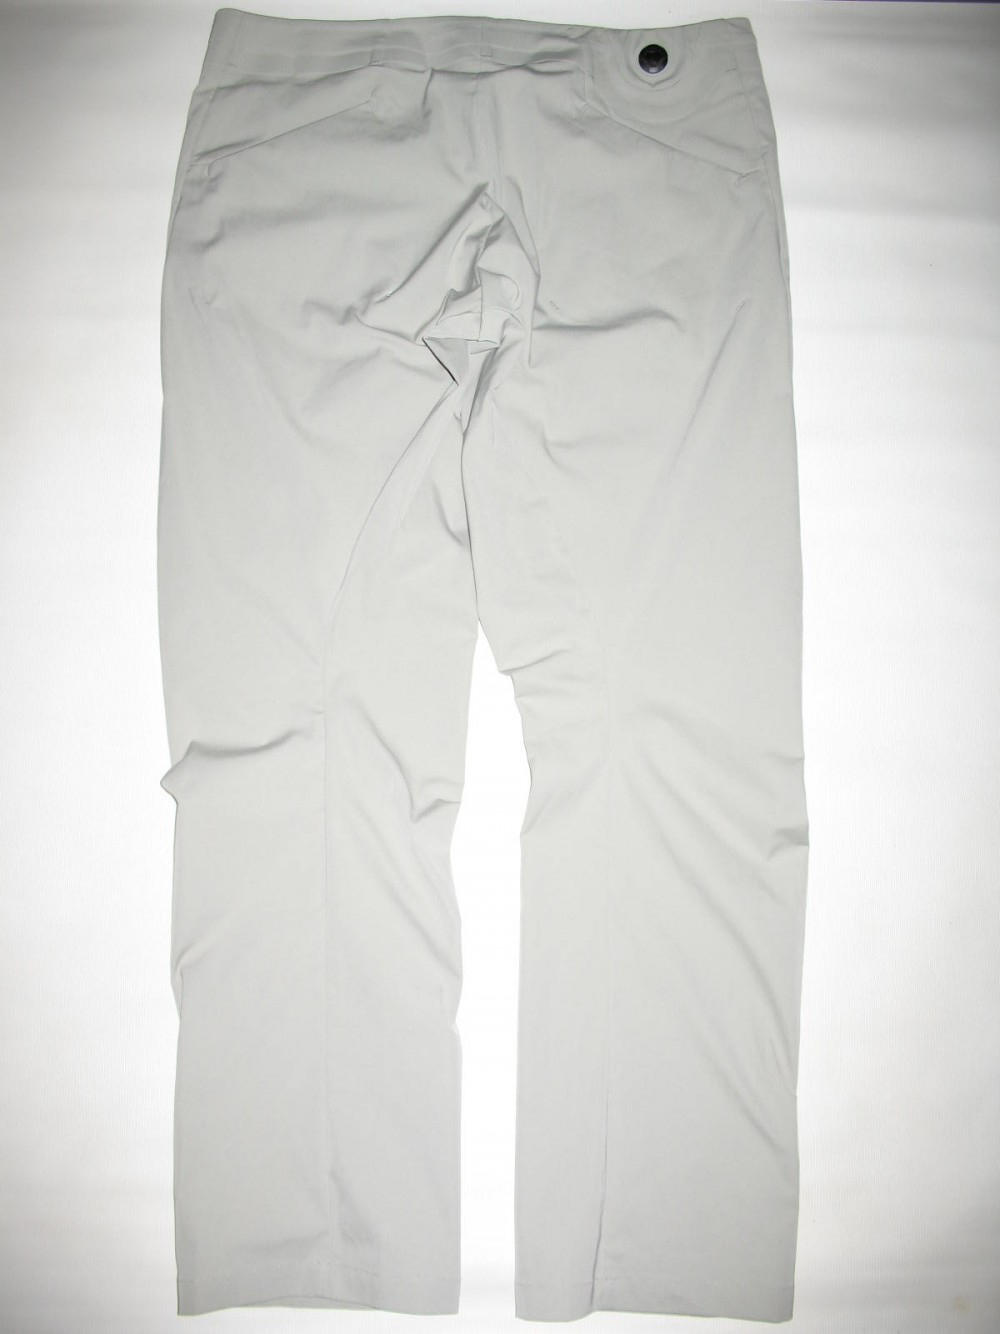 Штаны DESCENTE allterrain boa pants (размер 58-XL/XXL) - 1